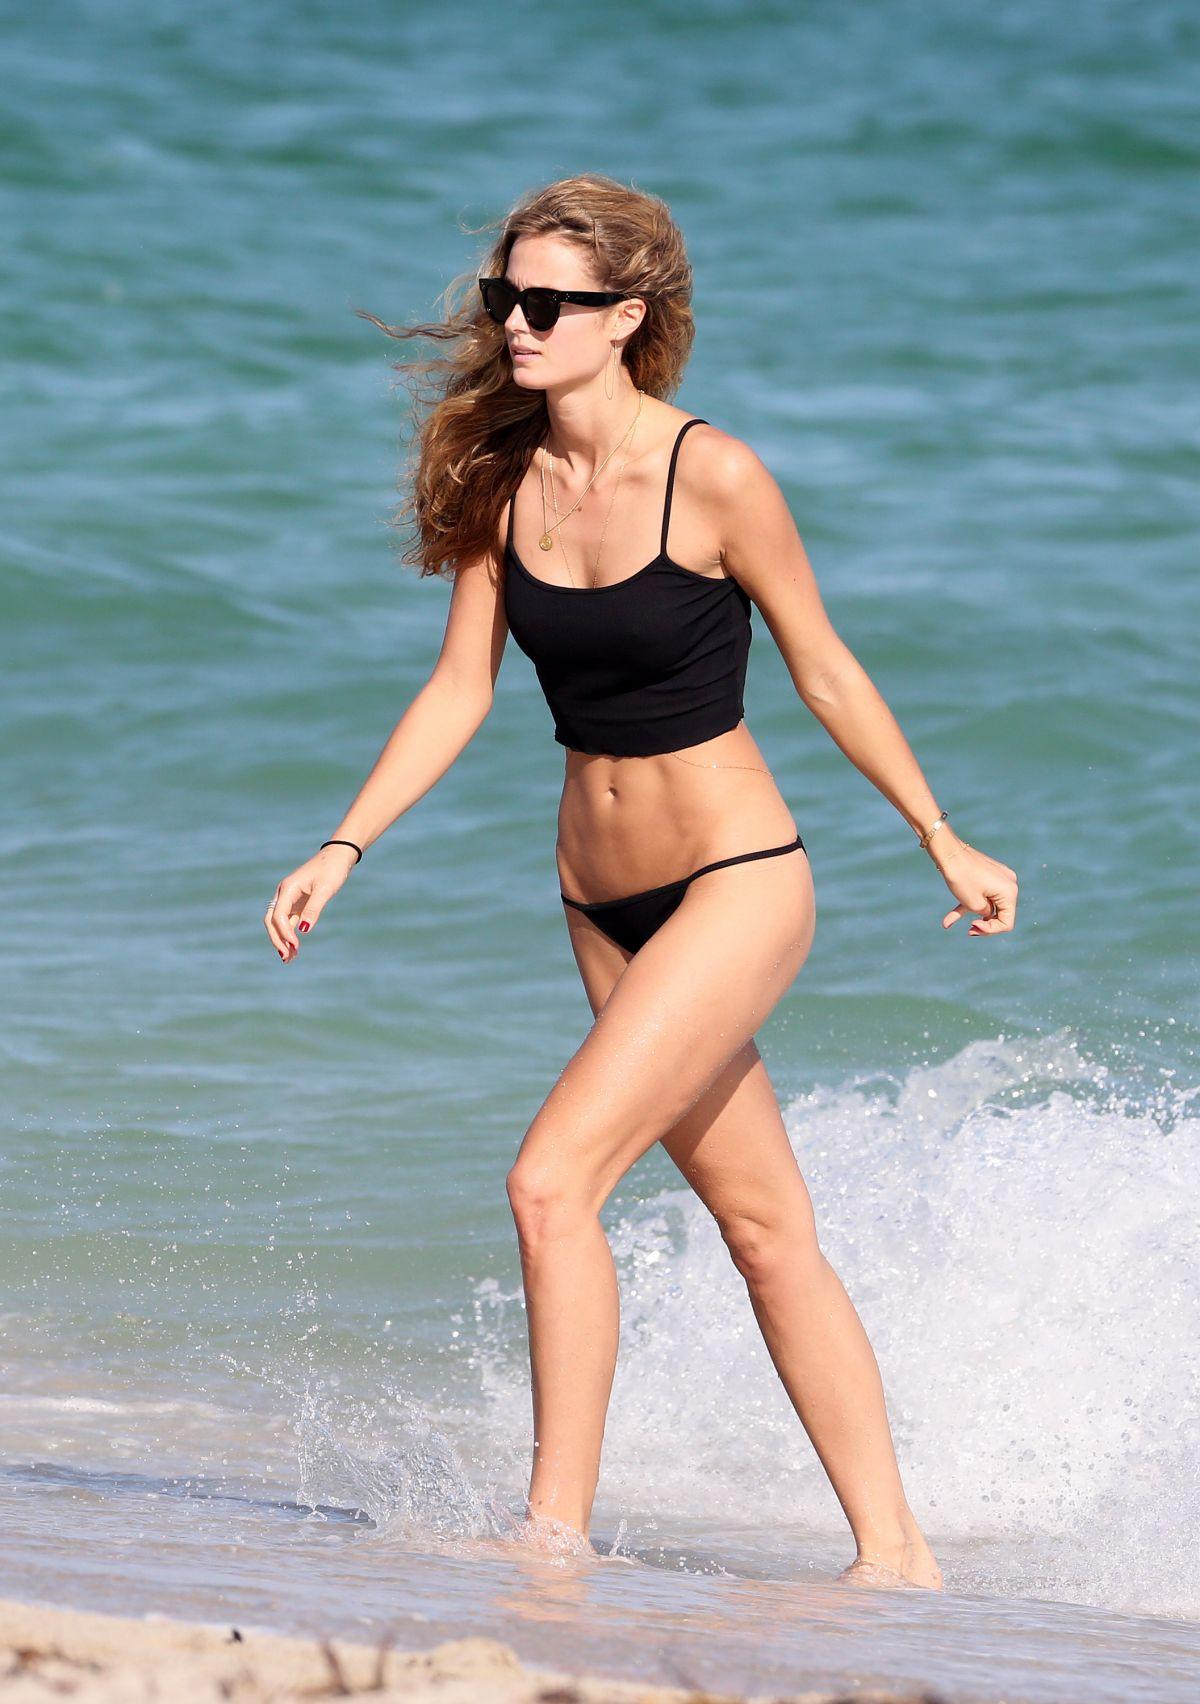 Kate Bock Bikini candids at the beach in Miami Beach Pic 26 of 35